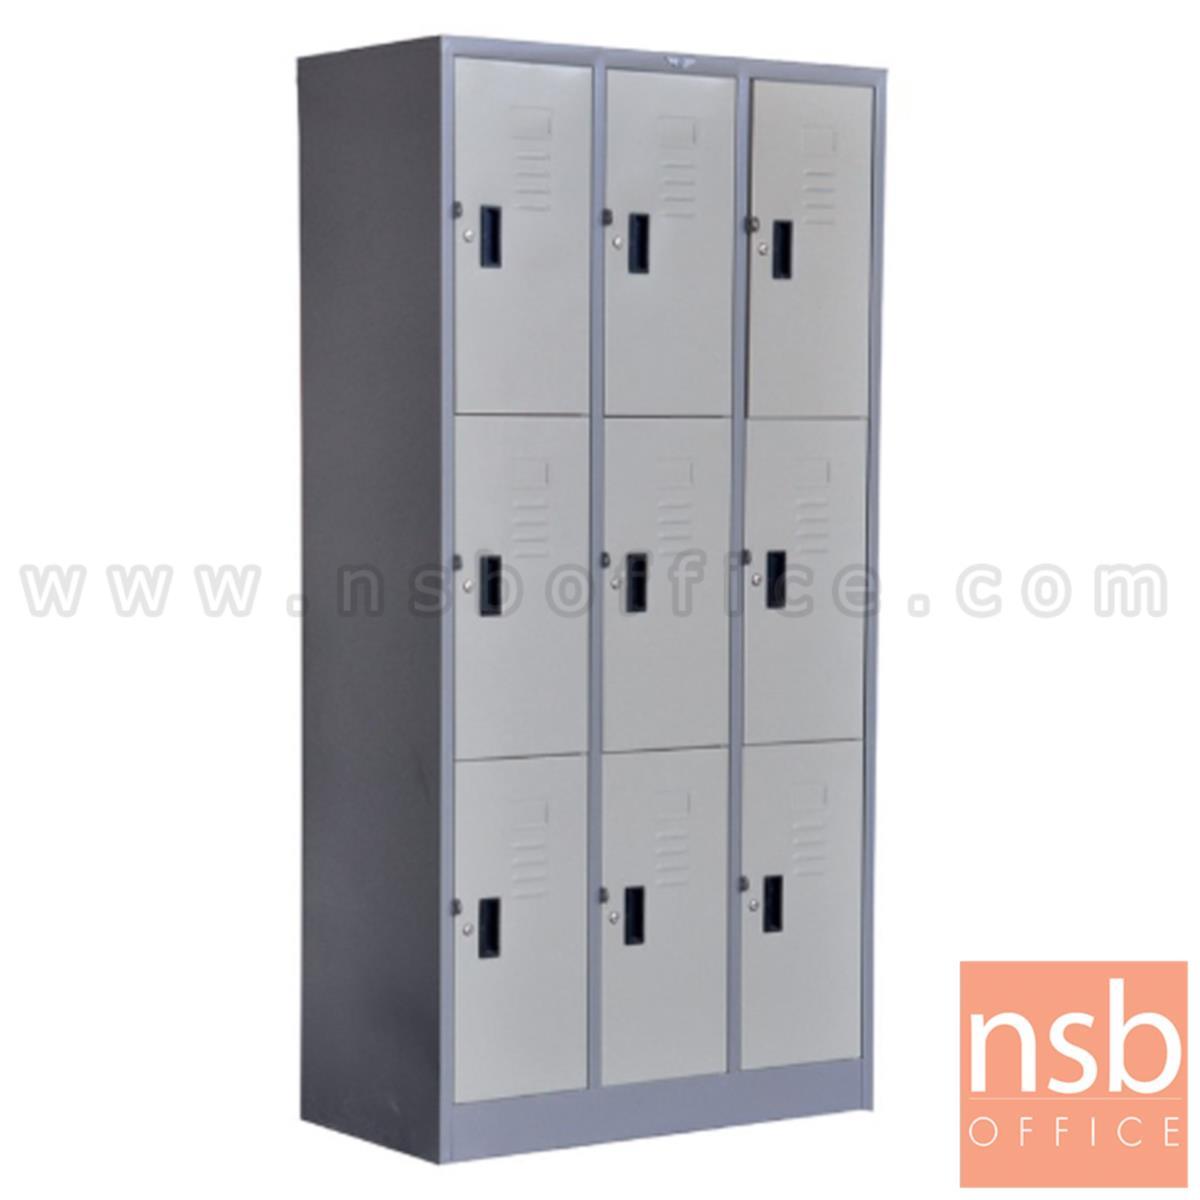 E08A007:ตู้ล็อกเกอร์ 9 ประตู รุ่น Roshan (โรชาน)  ขนาด 91.4W*45.7D*182.9H cm.